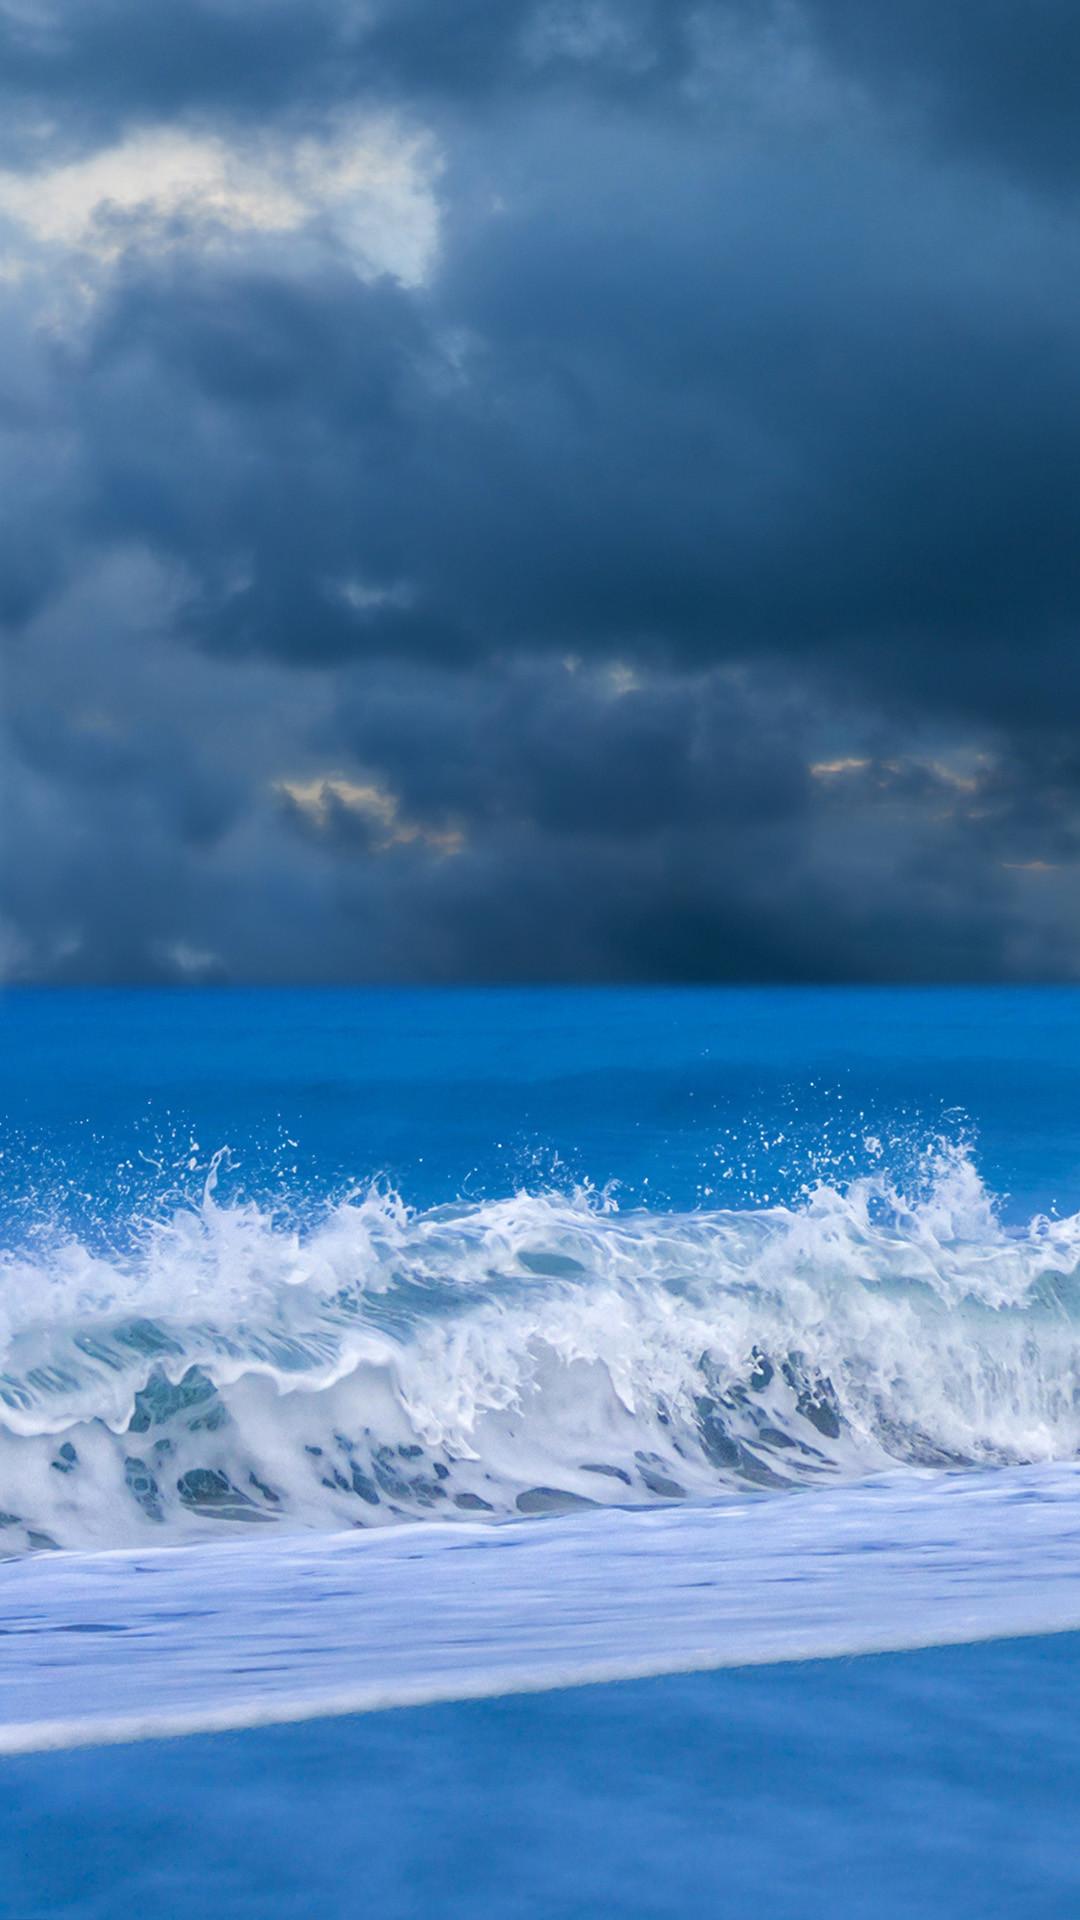 Beautiful waves iphone 6 plus wallpaper | iPhone 6 Plus Wallpapers HD